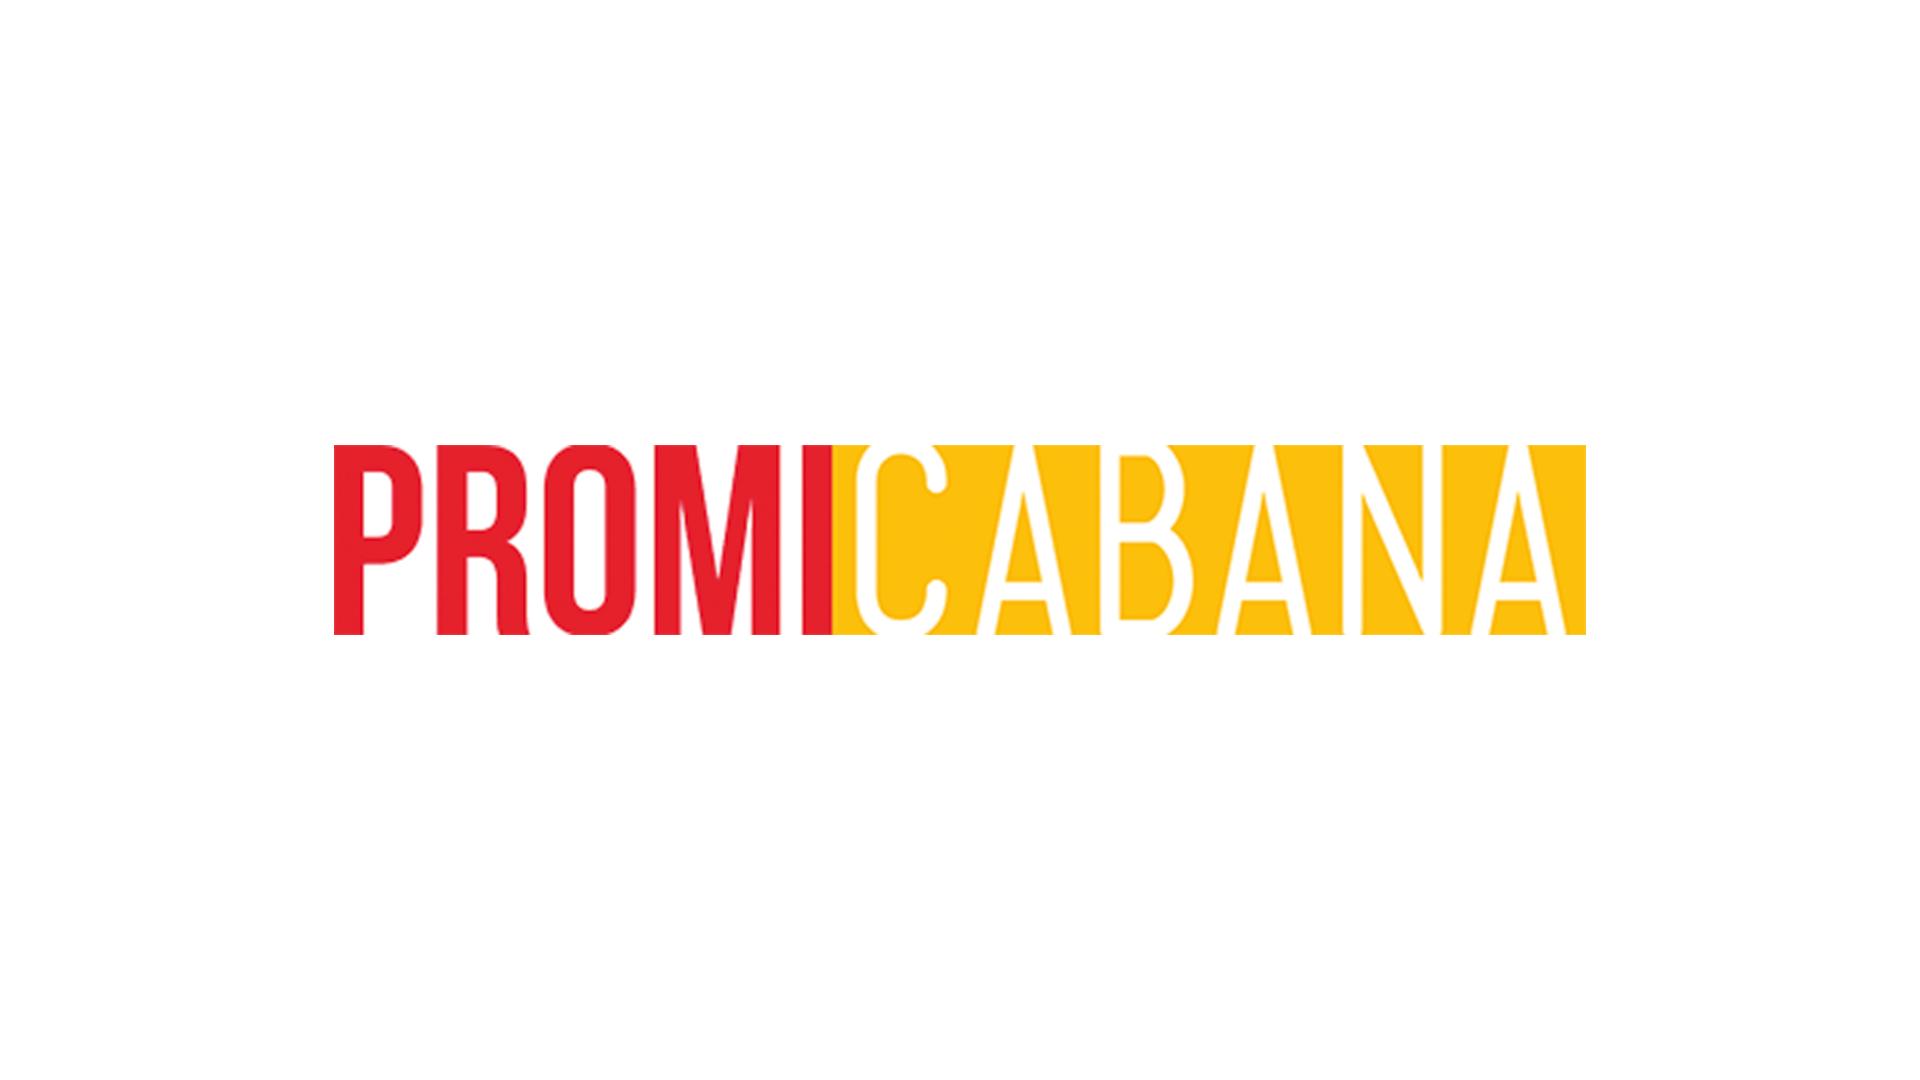 Chris-Pine-Zachary-Quinto-Star-Trek-Into-Darkness